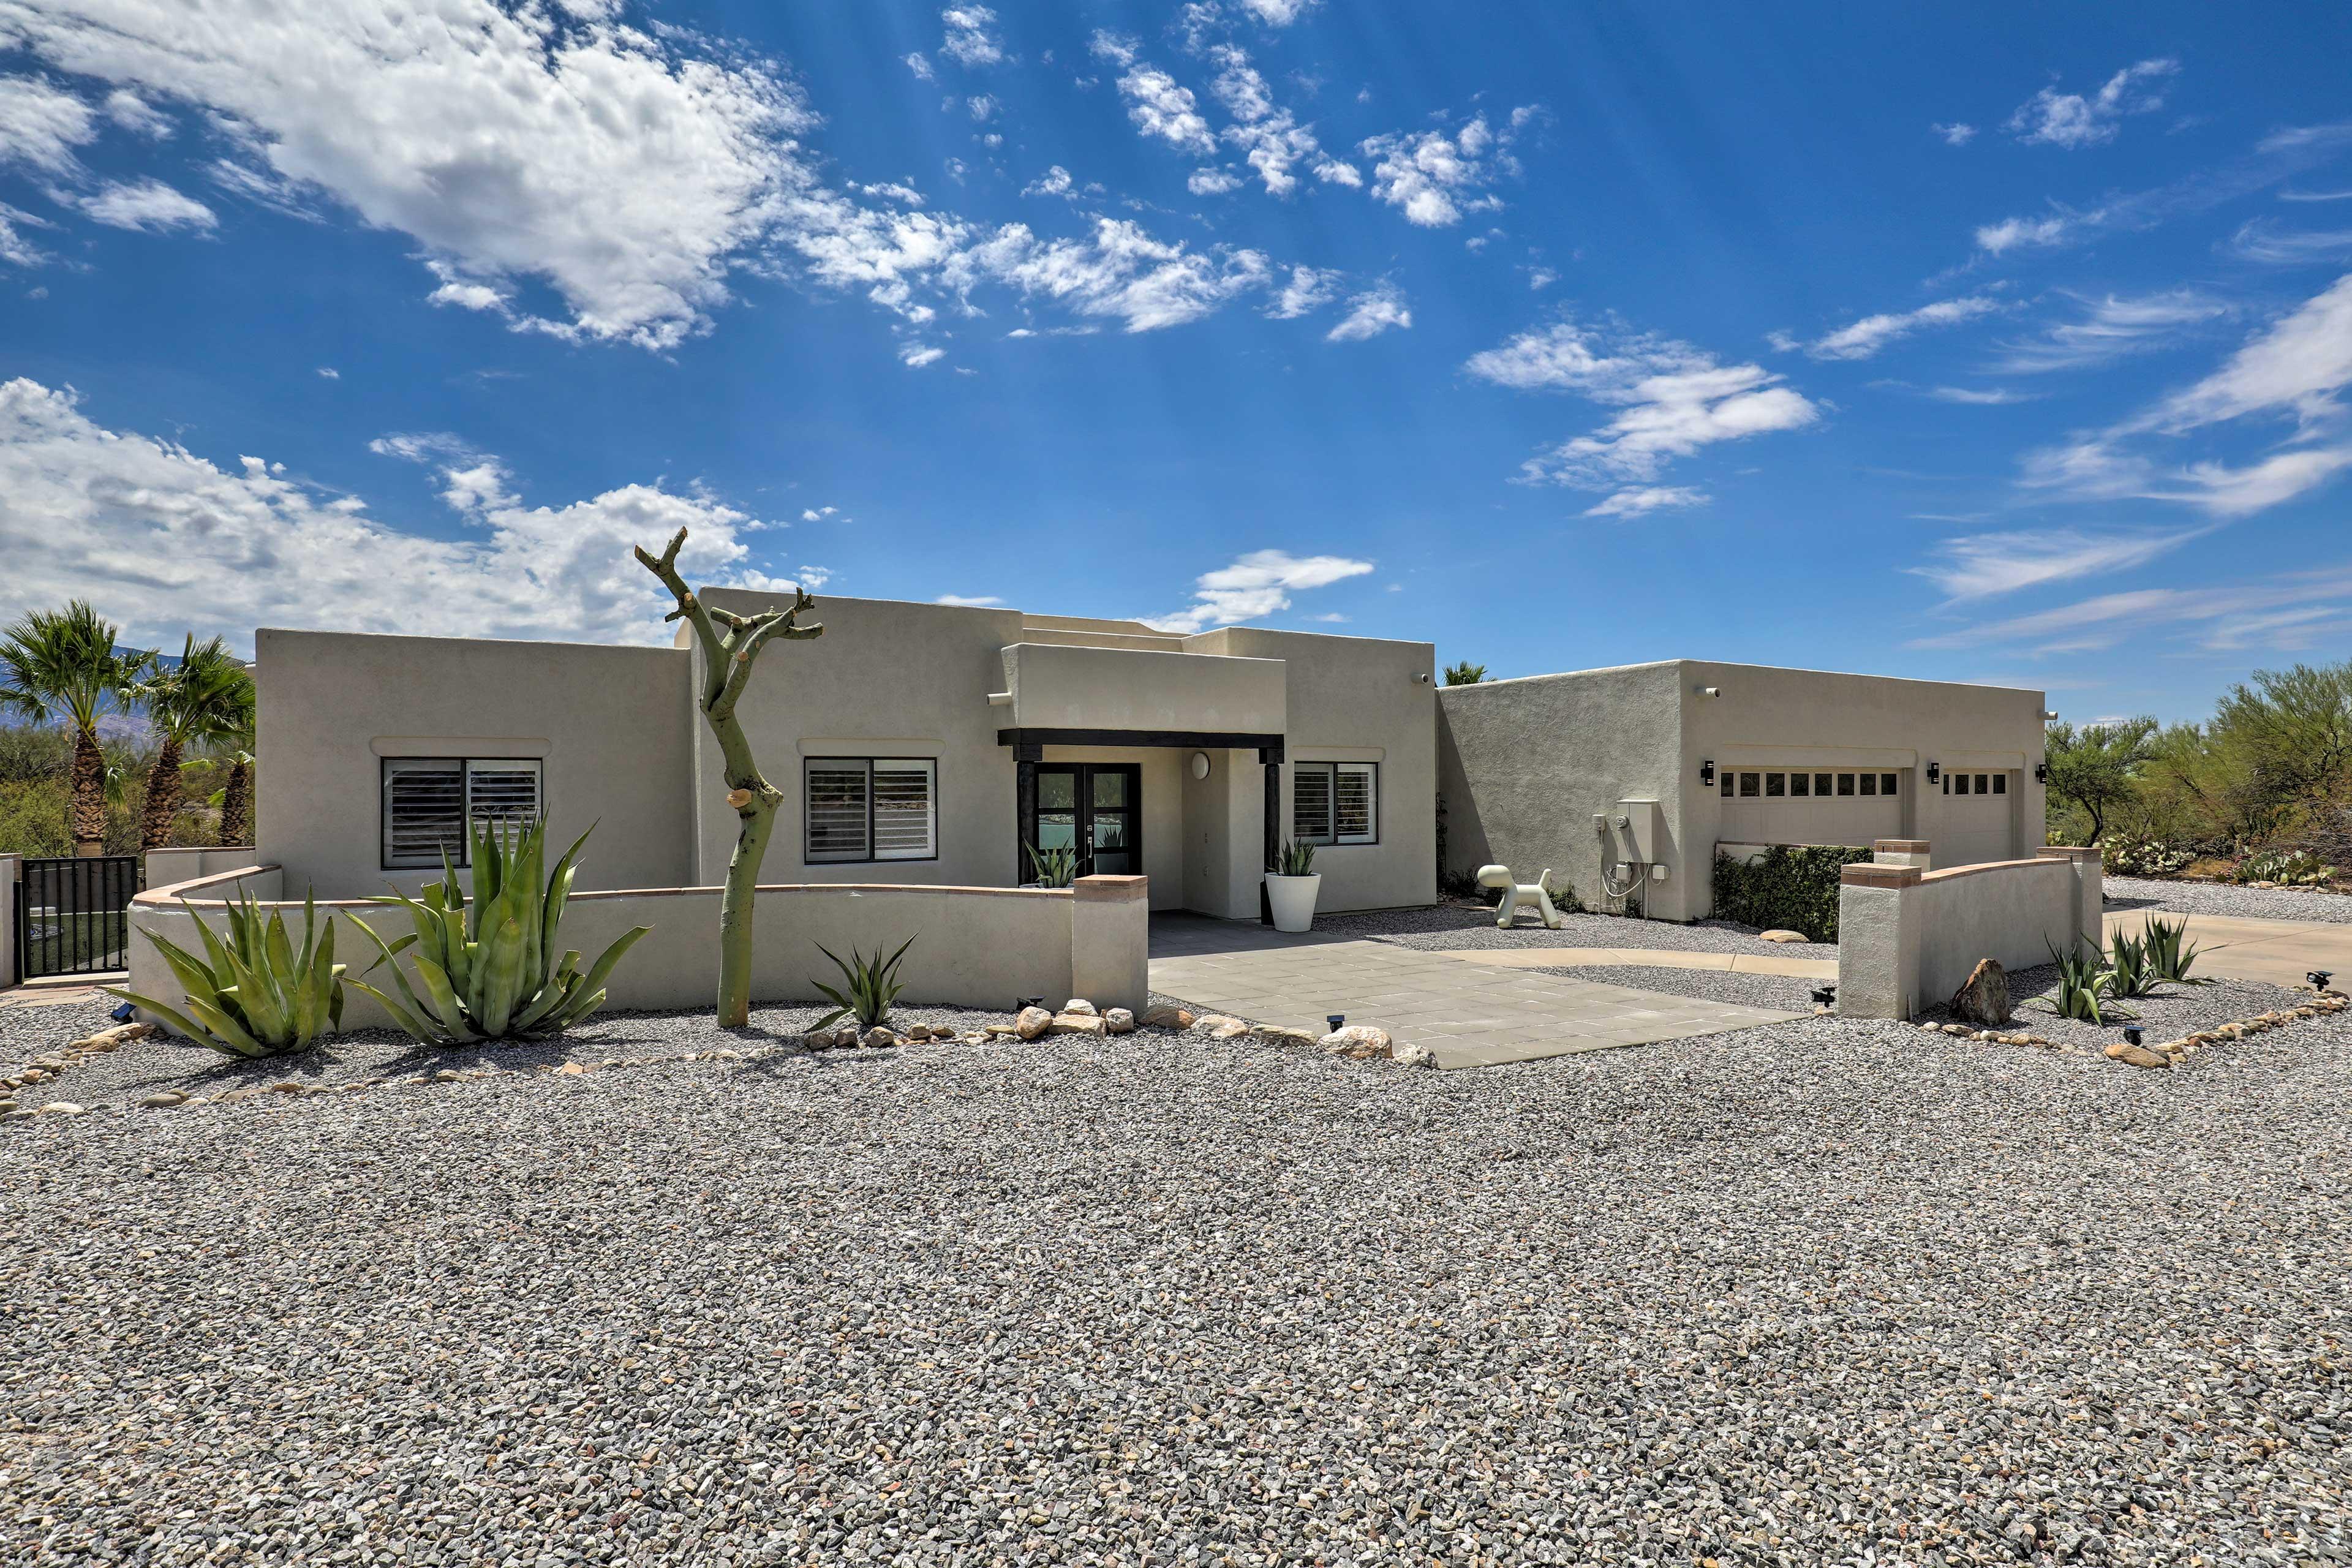 This architecture belongs in a true desert landscape.